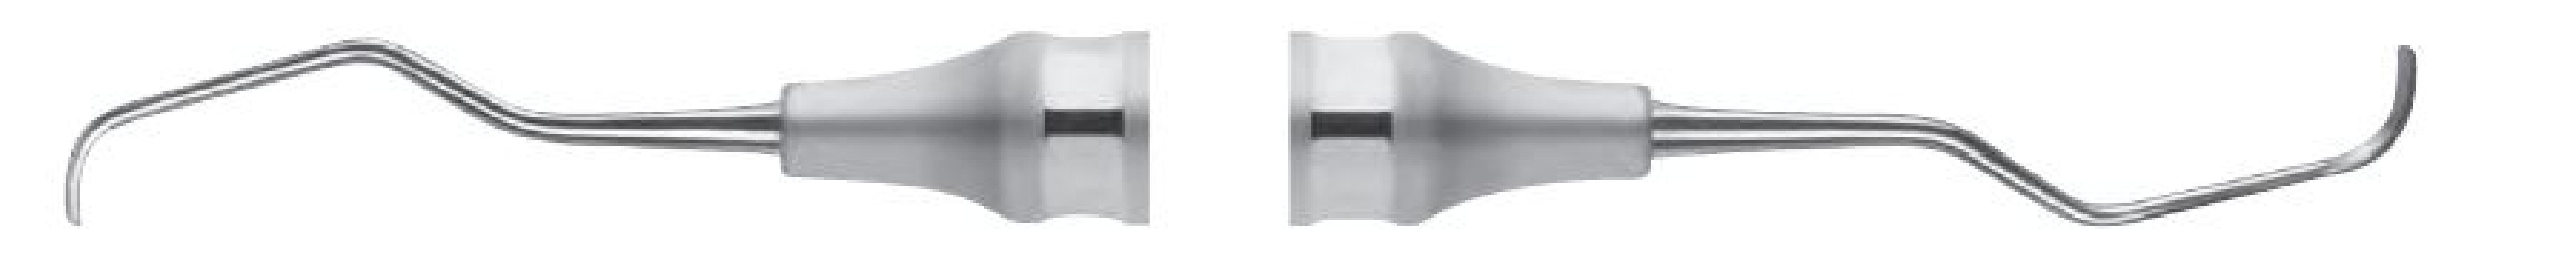 An image of Curette